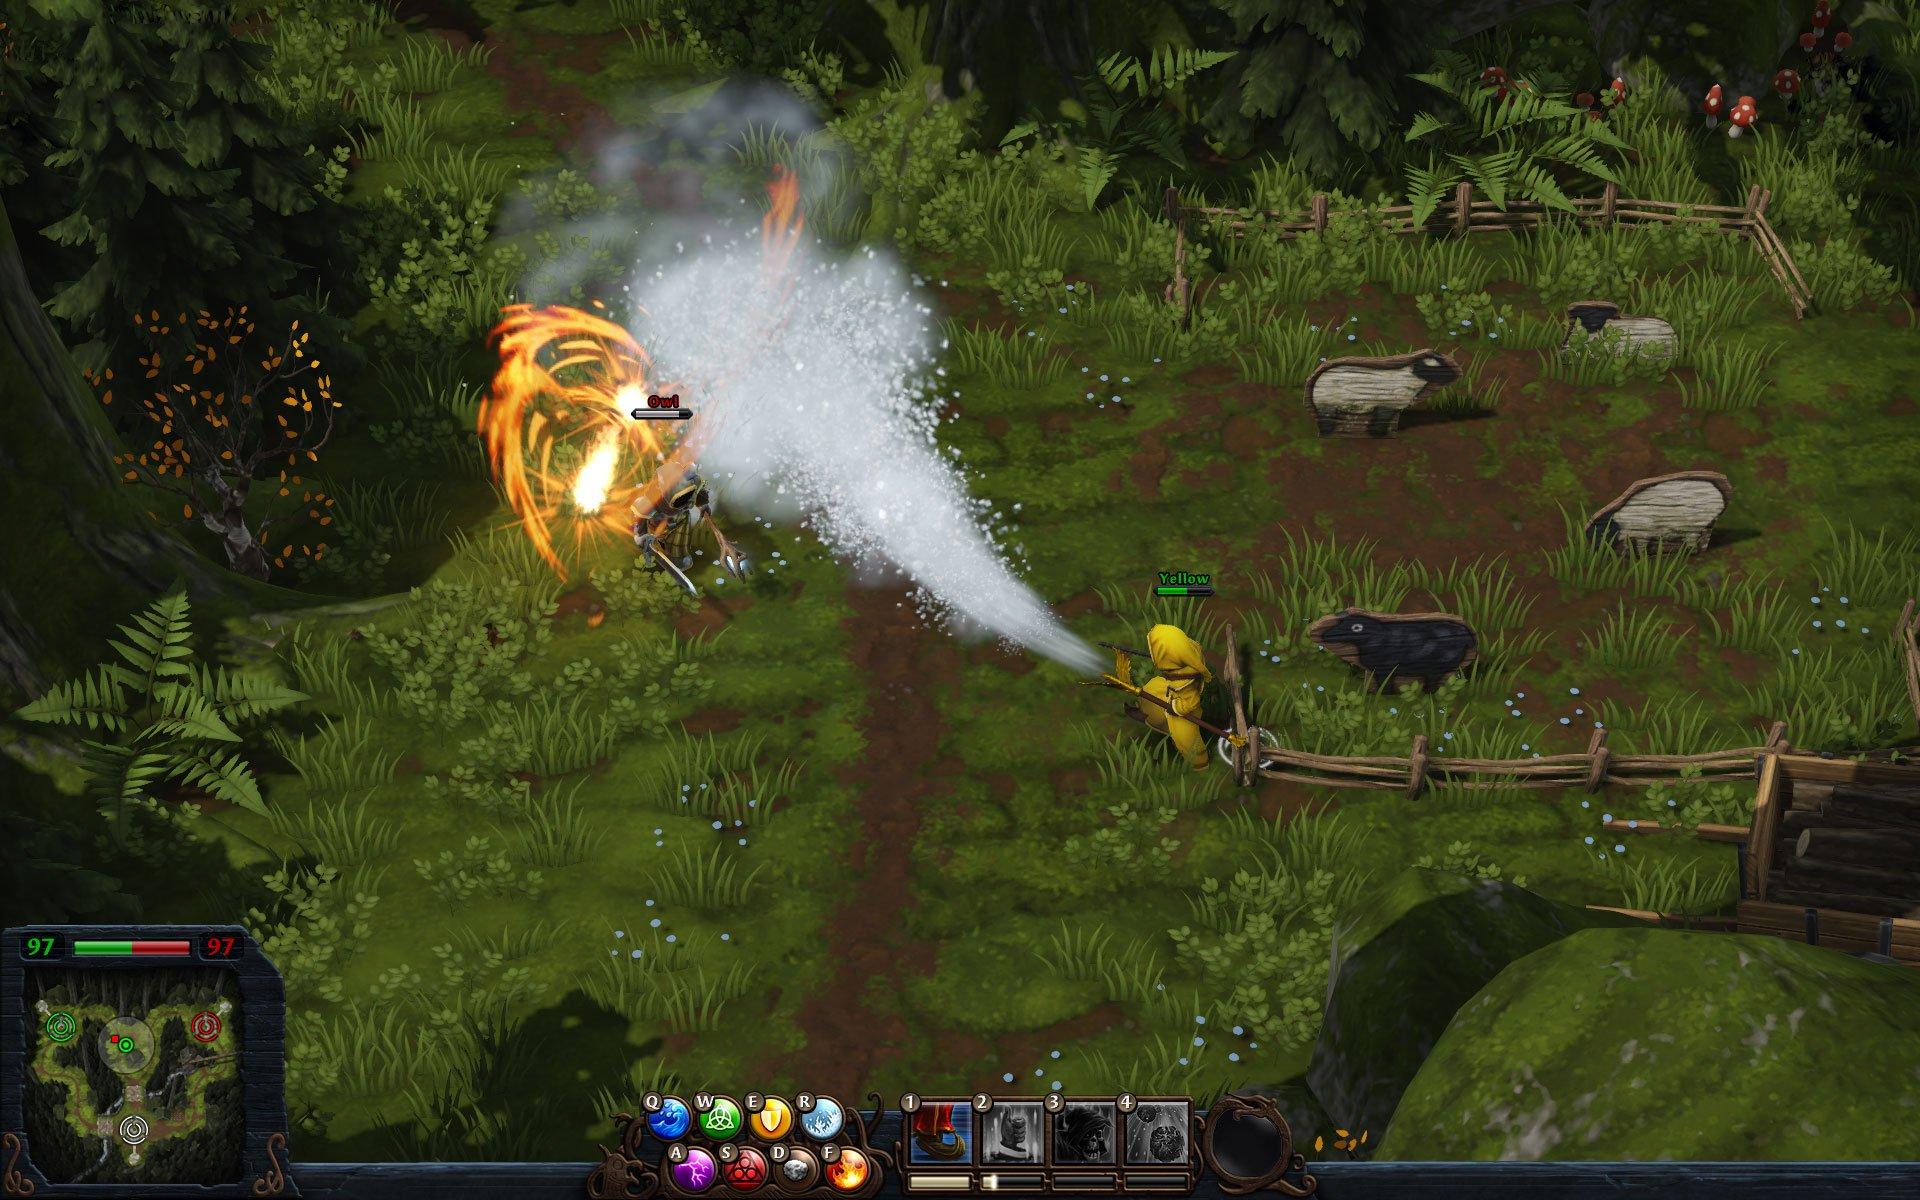 игры для xbox 360 prince of persia